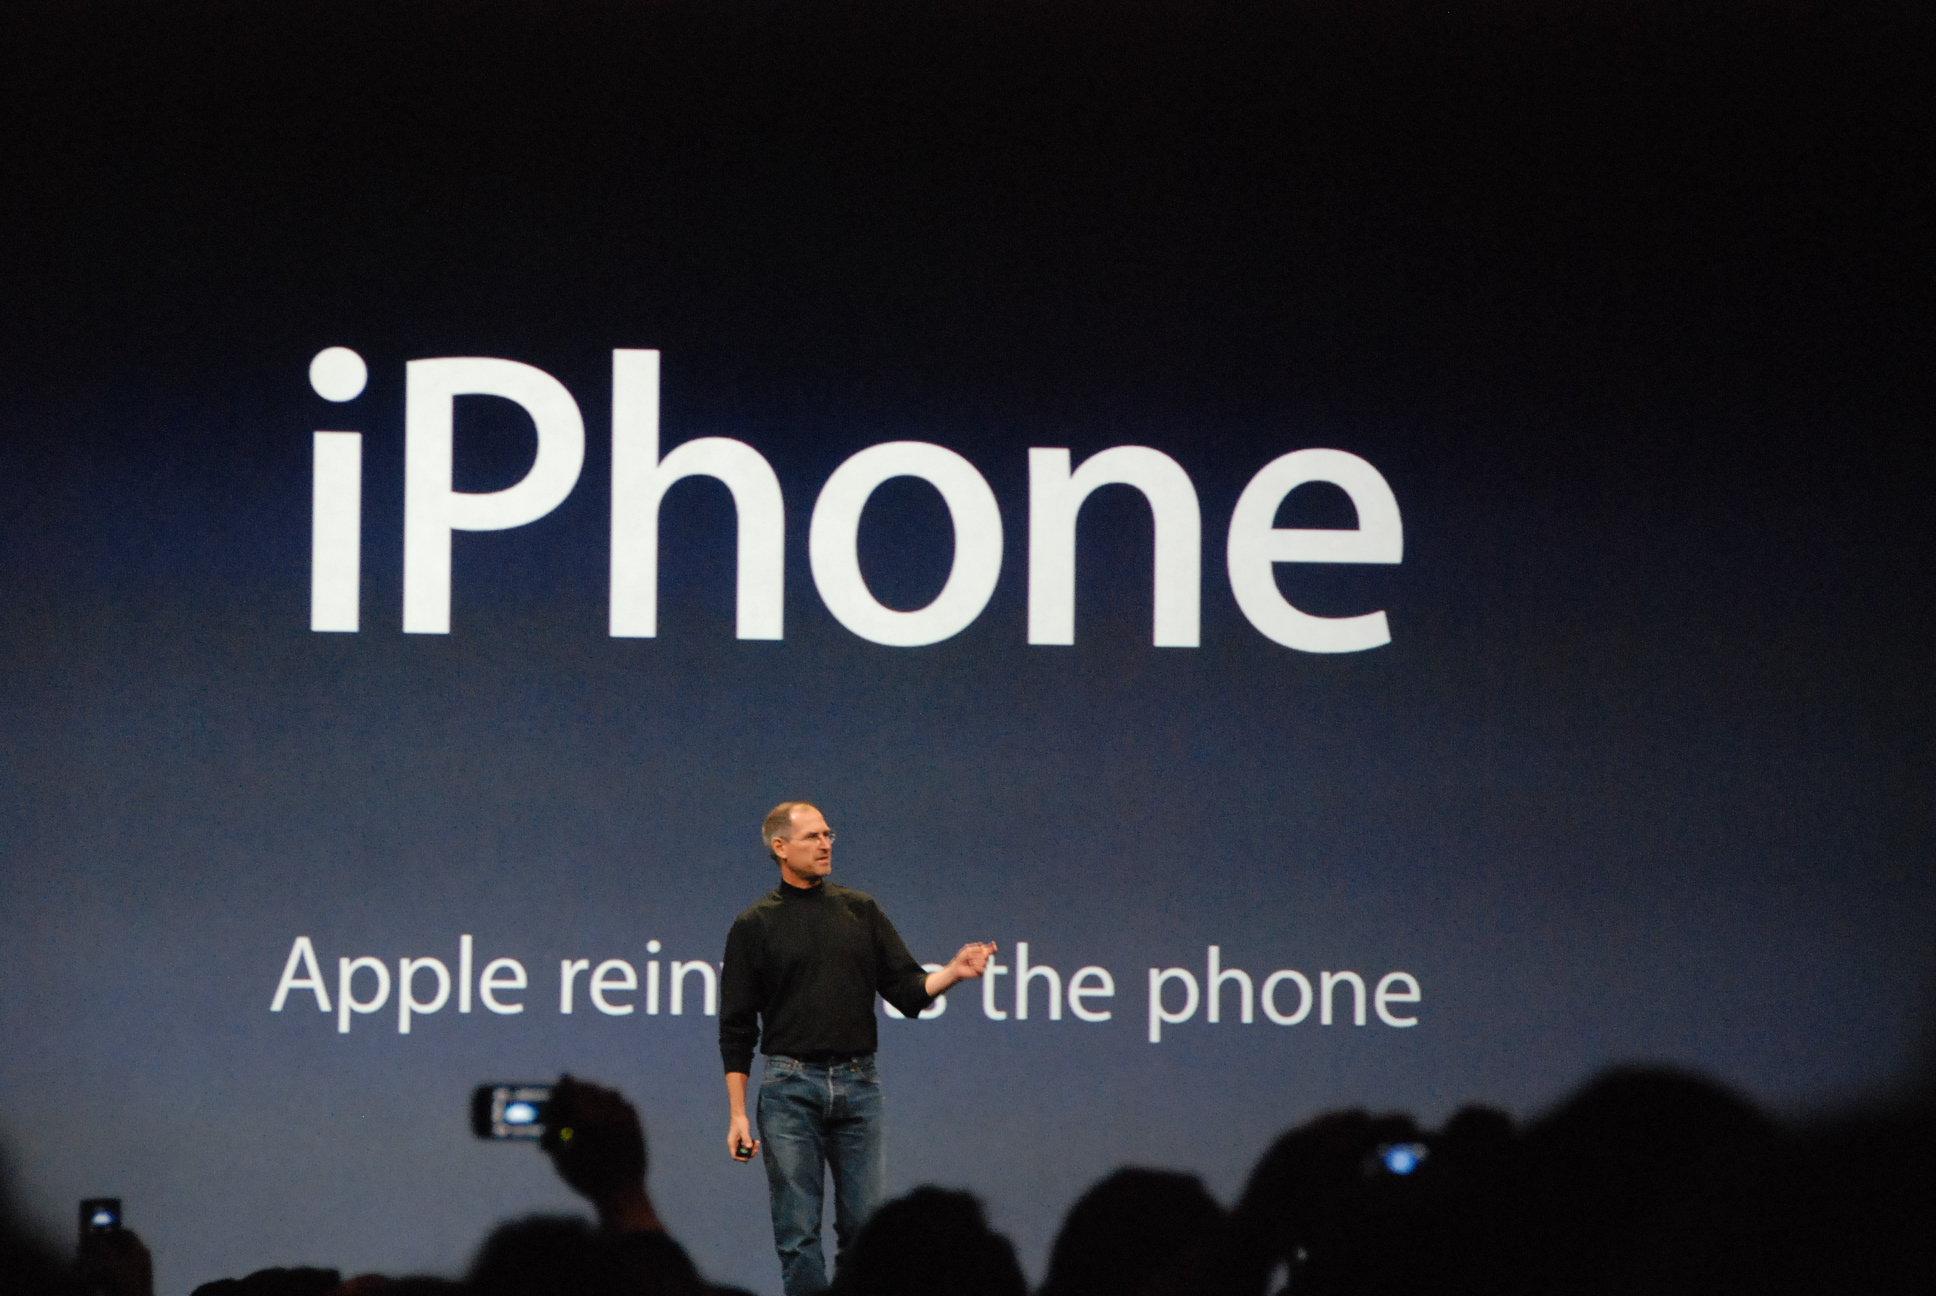 steve_jobs_presents_iphone